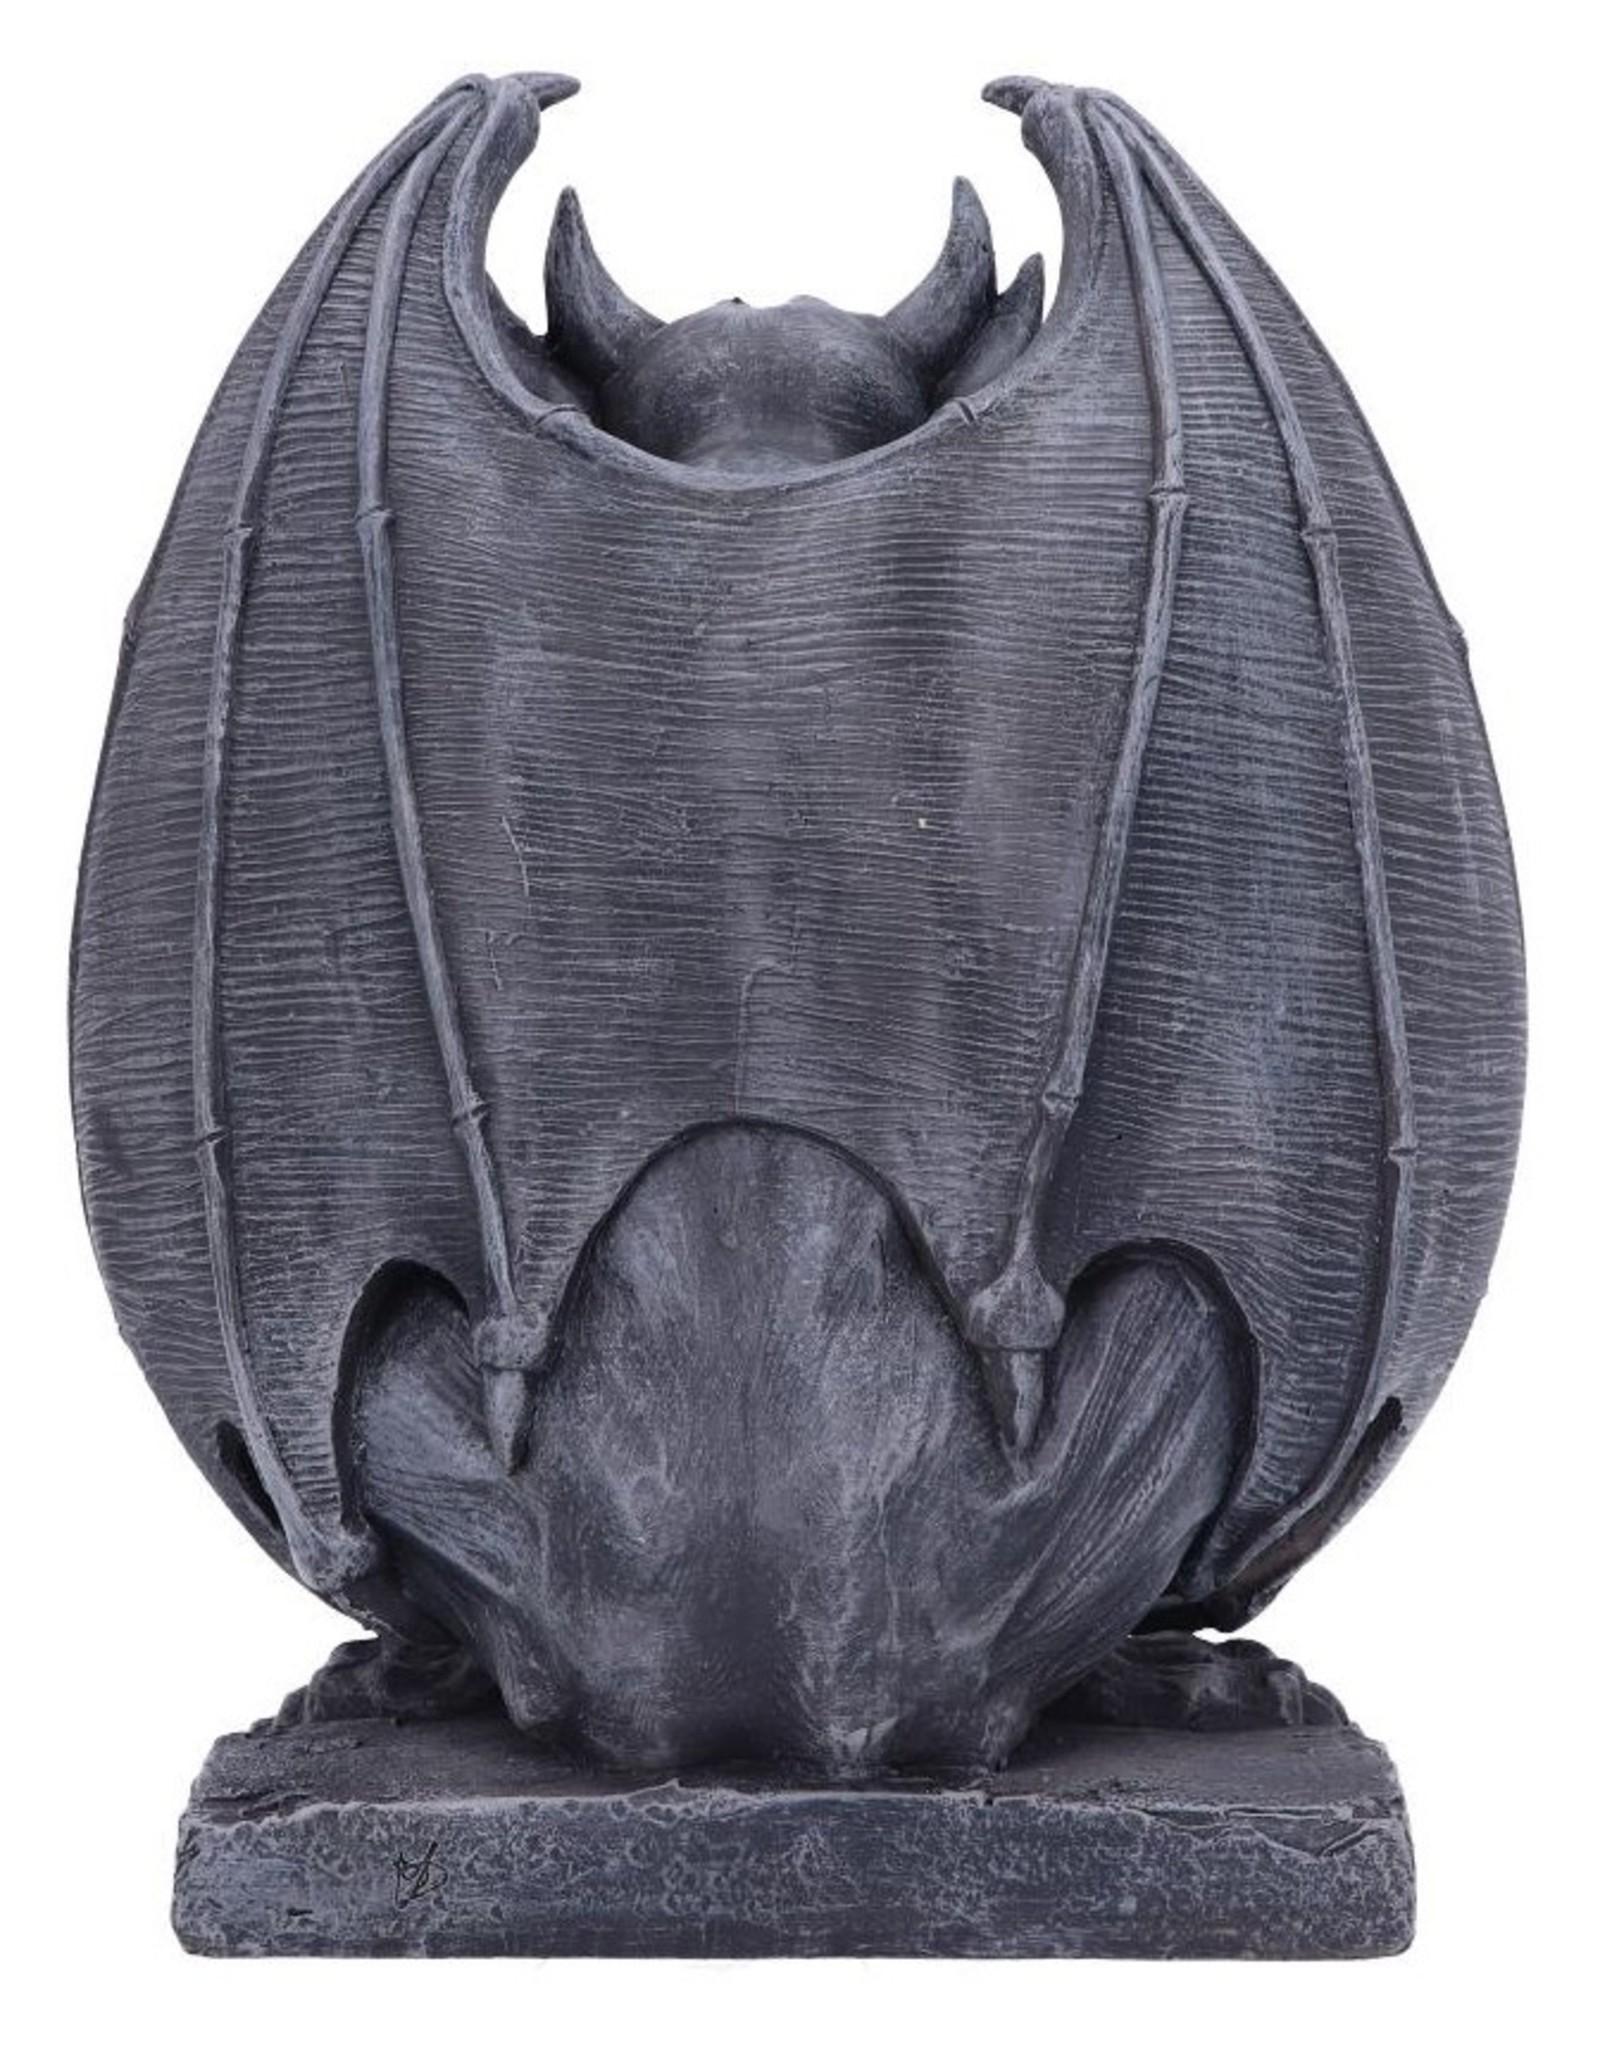 Nemesis Now Giftware Figurines Collectables - Adalward Dark Black Gargoyle 26cm